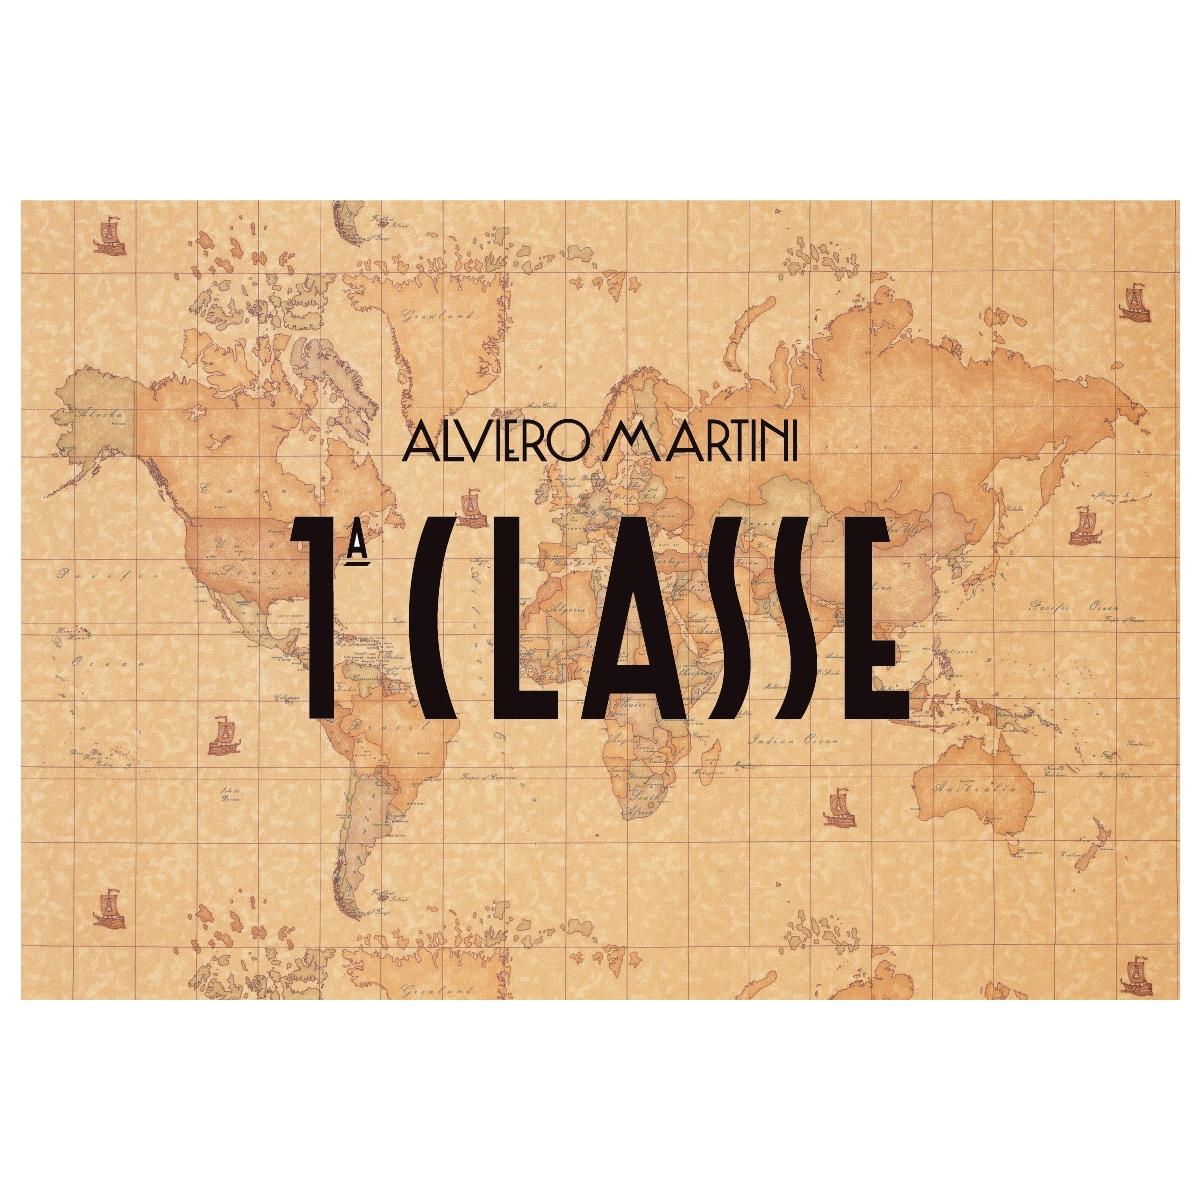 Set Bagno Alviero Martini.Set Prima Classe Alviero Martini